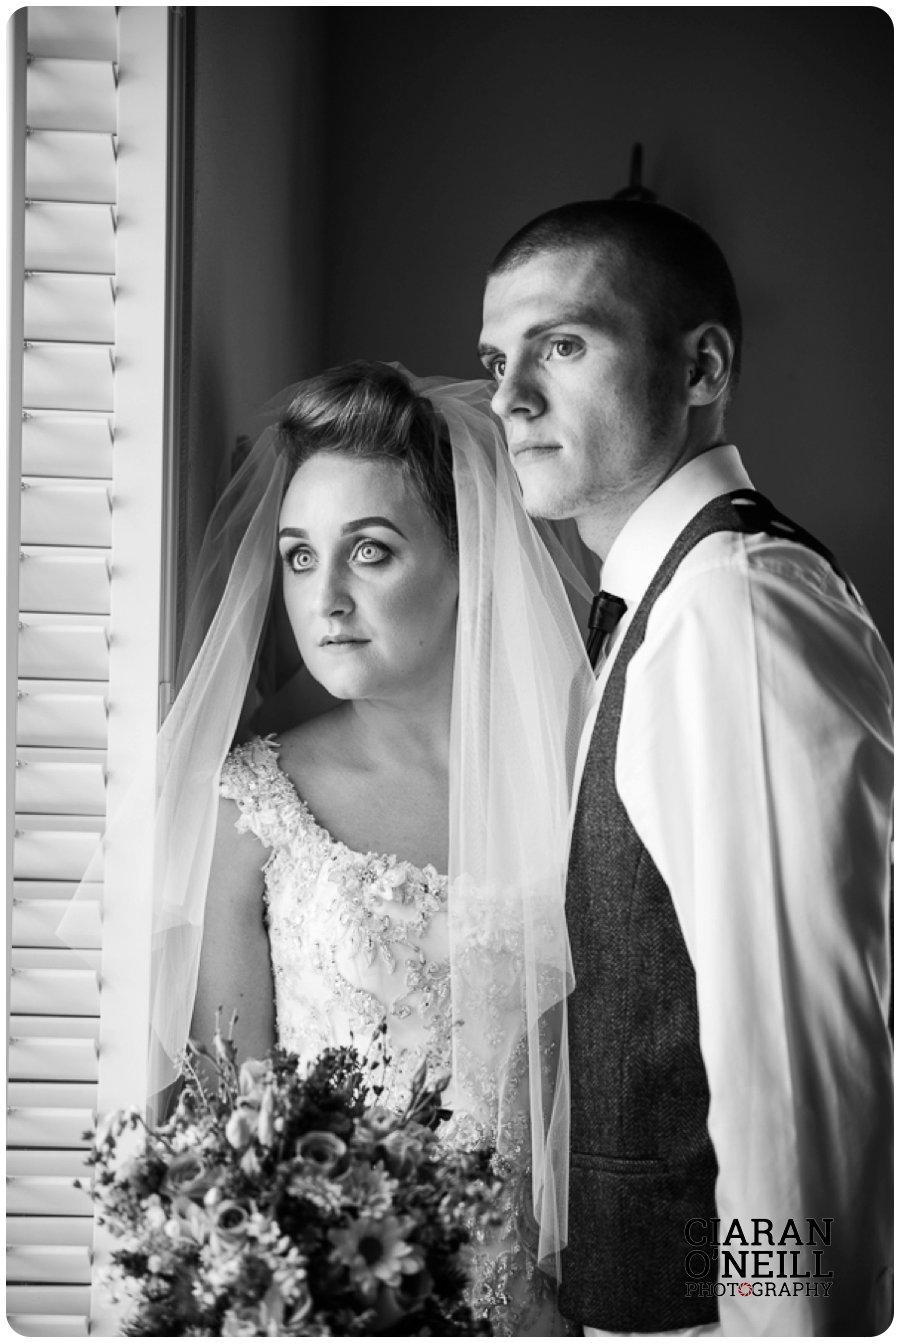 Amy & Tyler's wedding at Lusty Beg Island by Ciaran O'Neill Photography 21